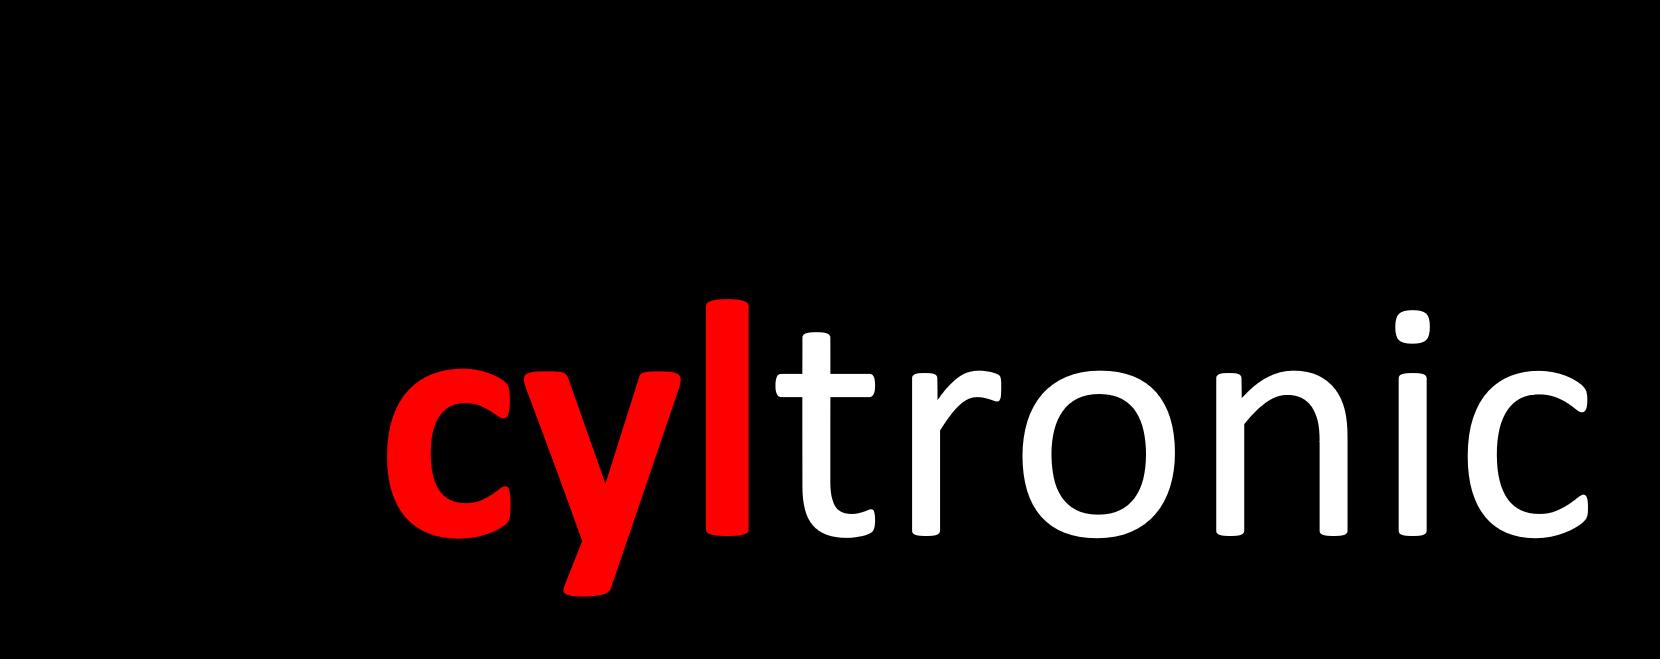 Cyltronic